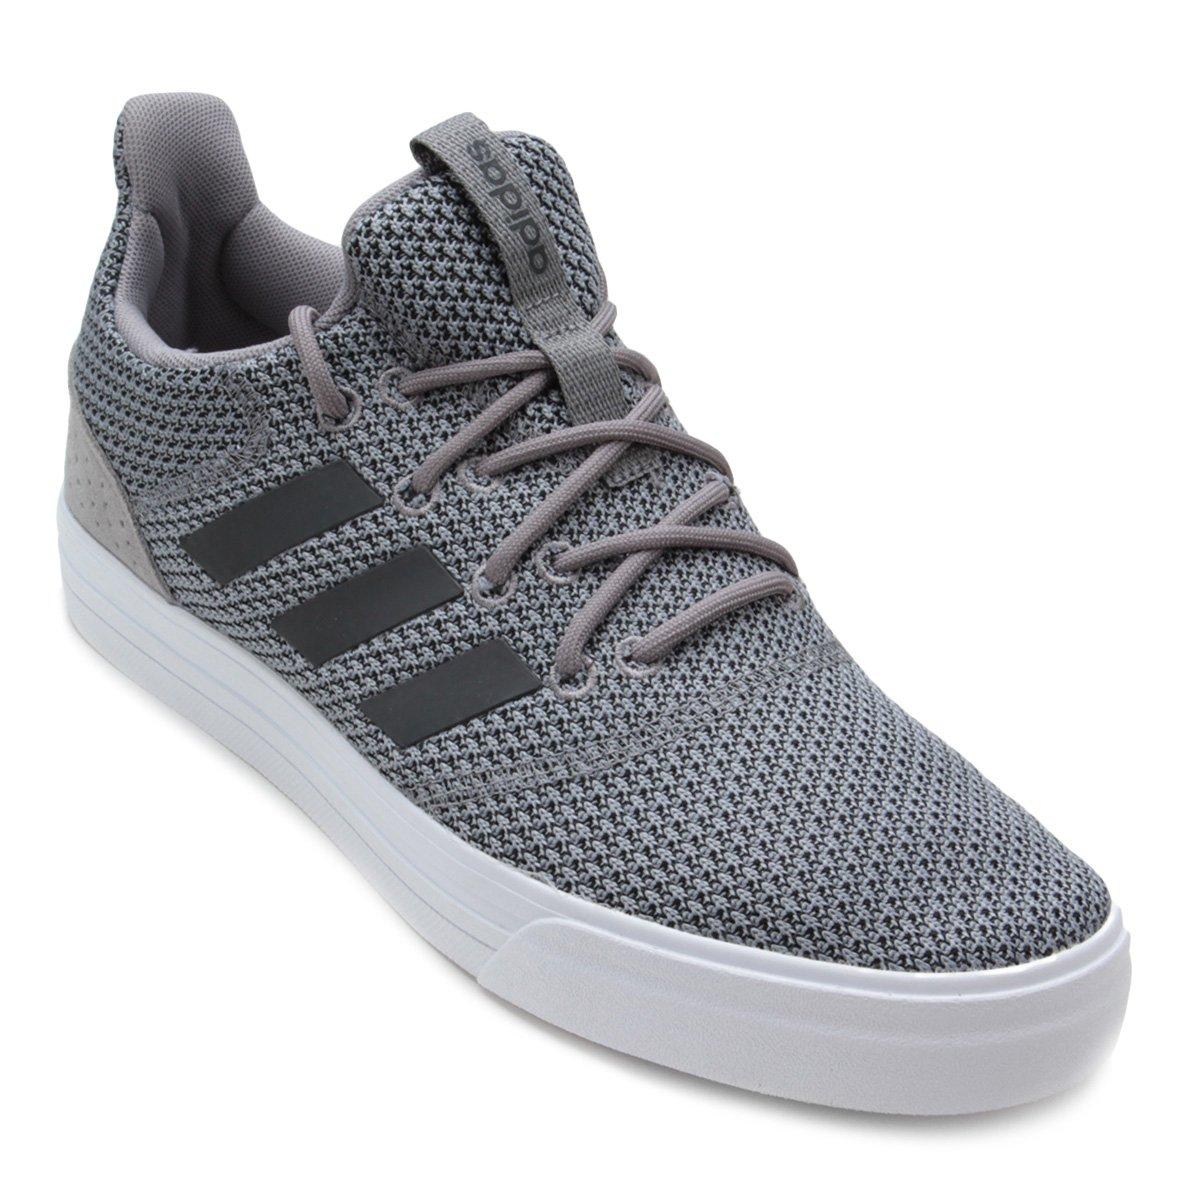 adidas true street shoes